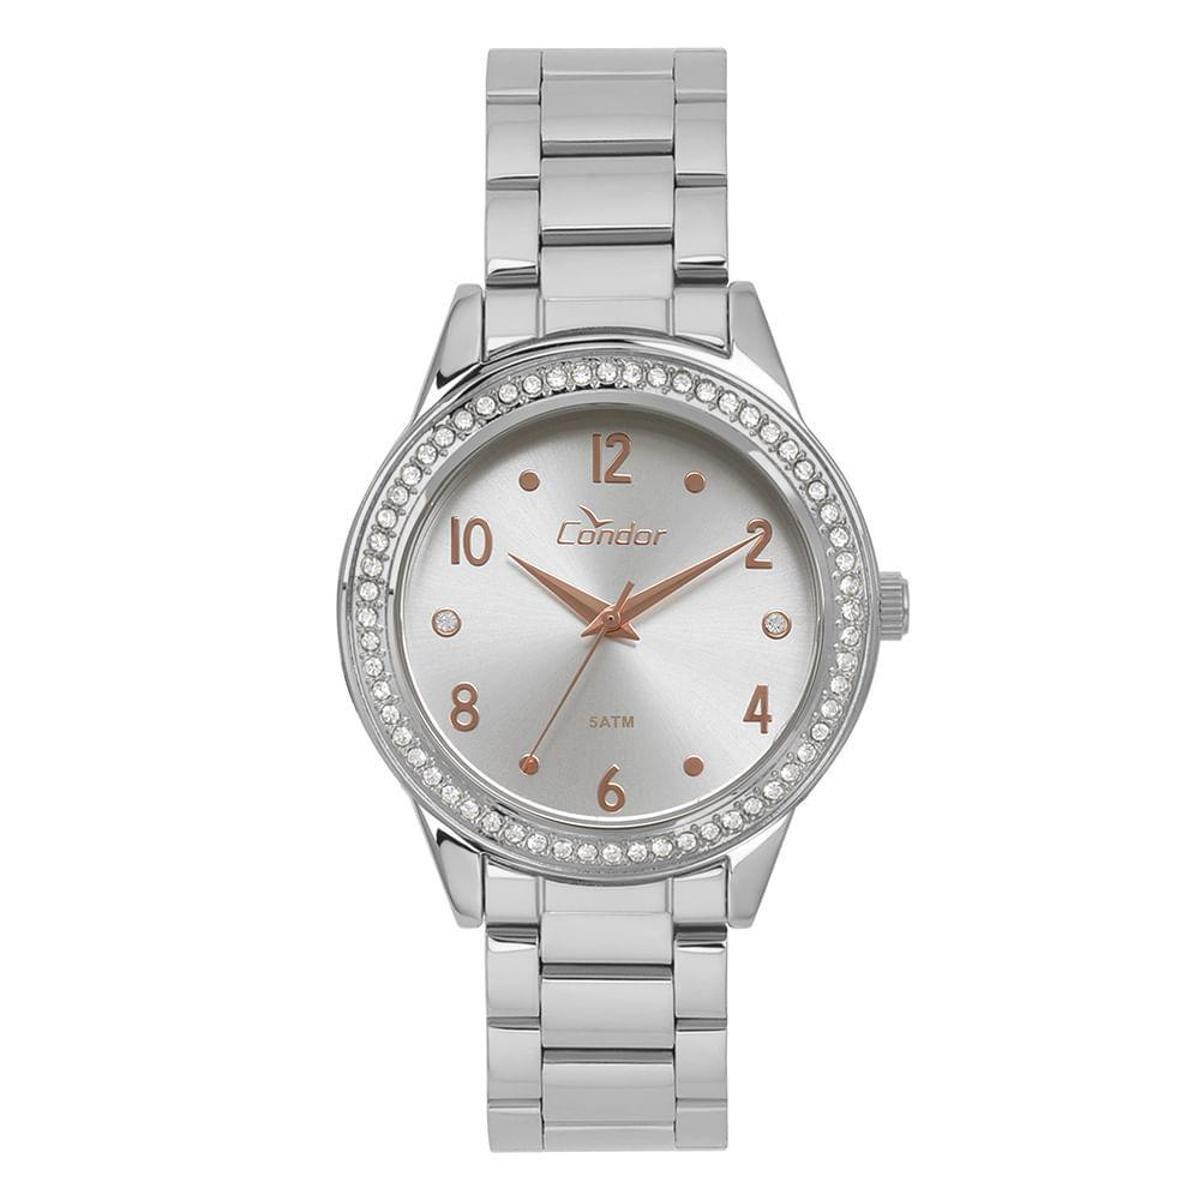 80472afdf73 Relógio Condor Feminino Bracelete - CO2036KUK 3K CO2036KUK 3K ...